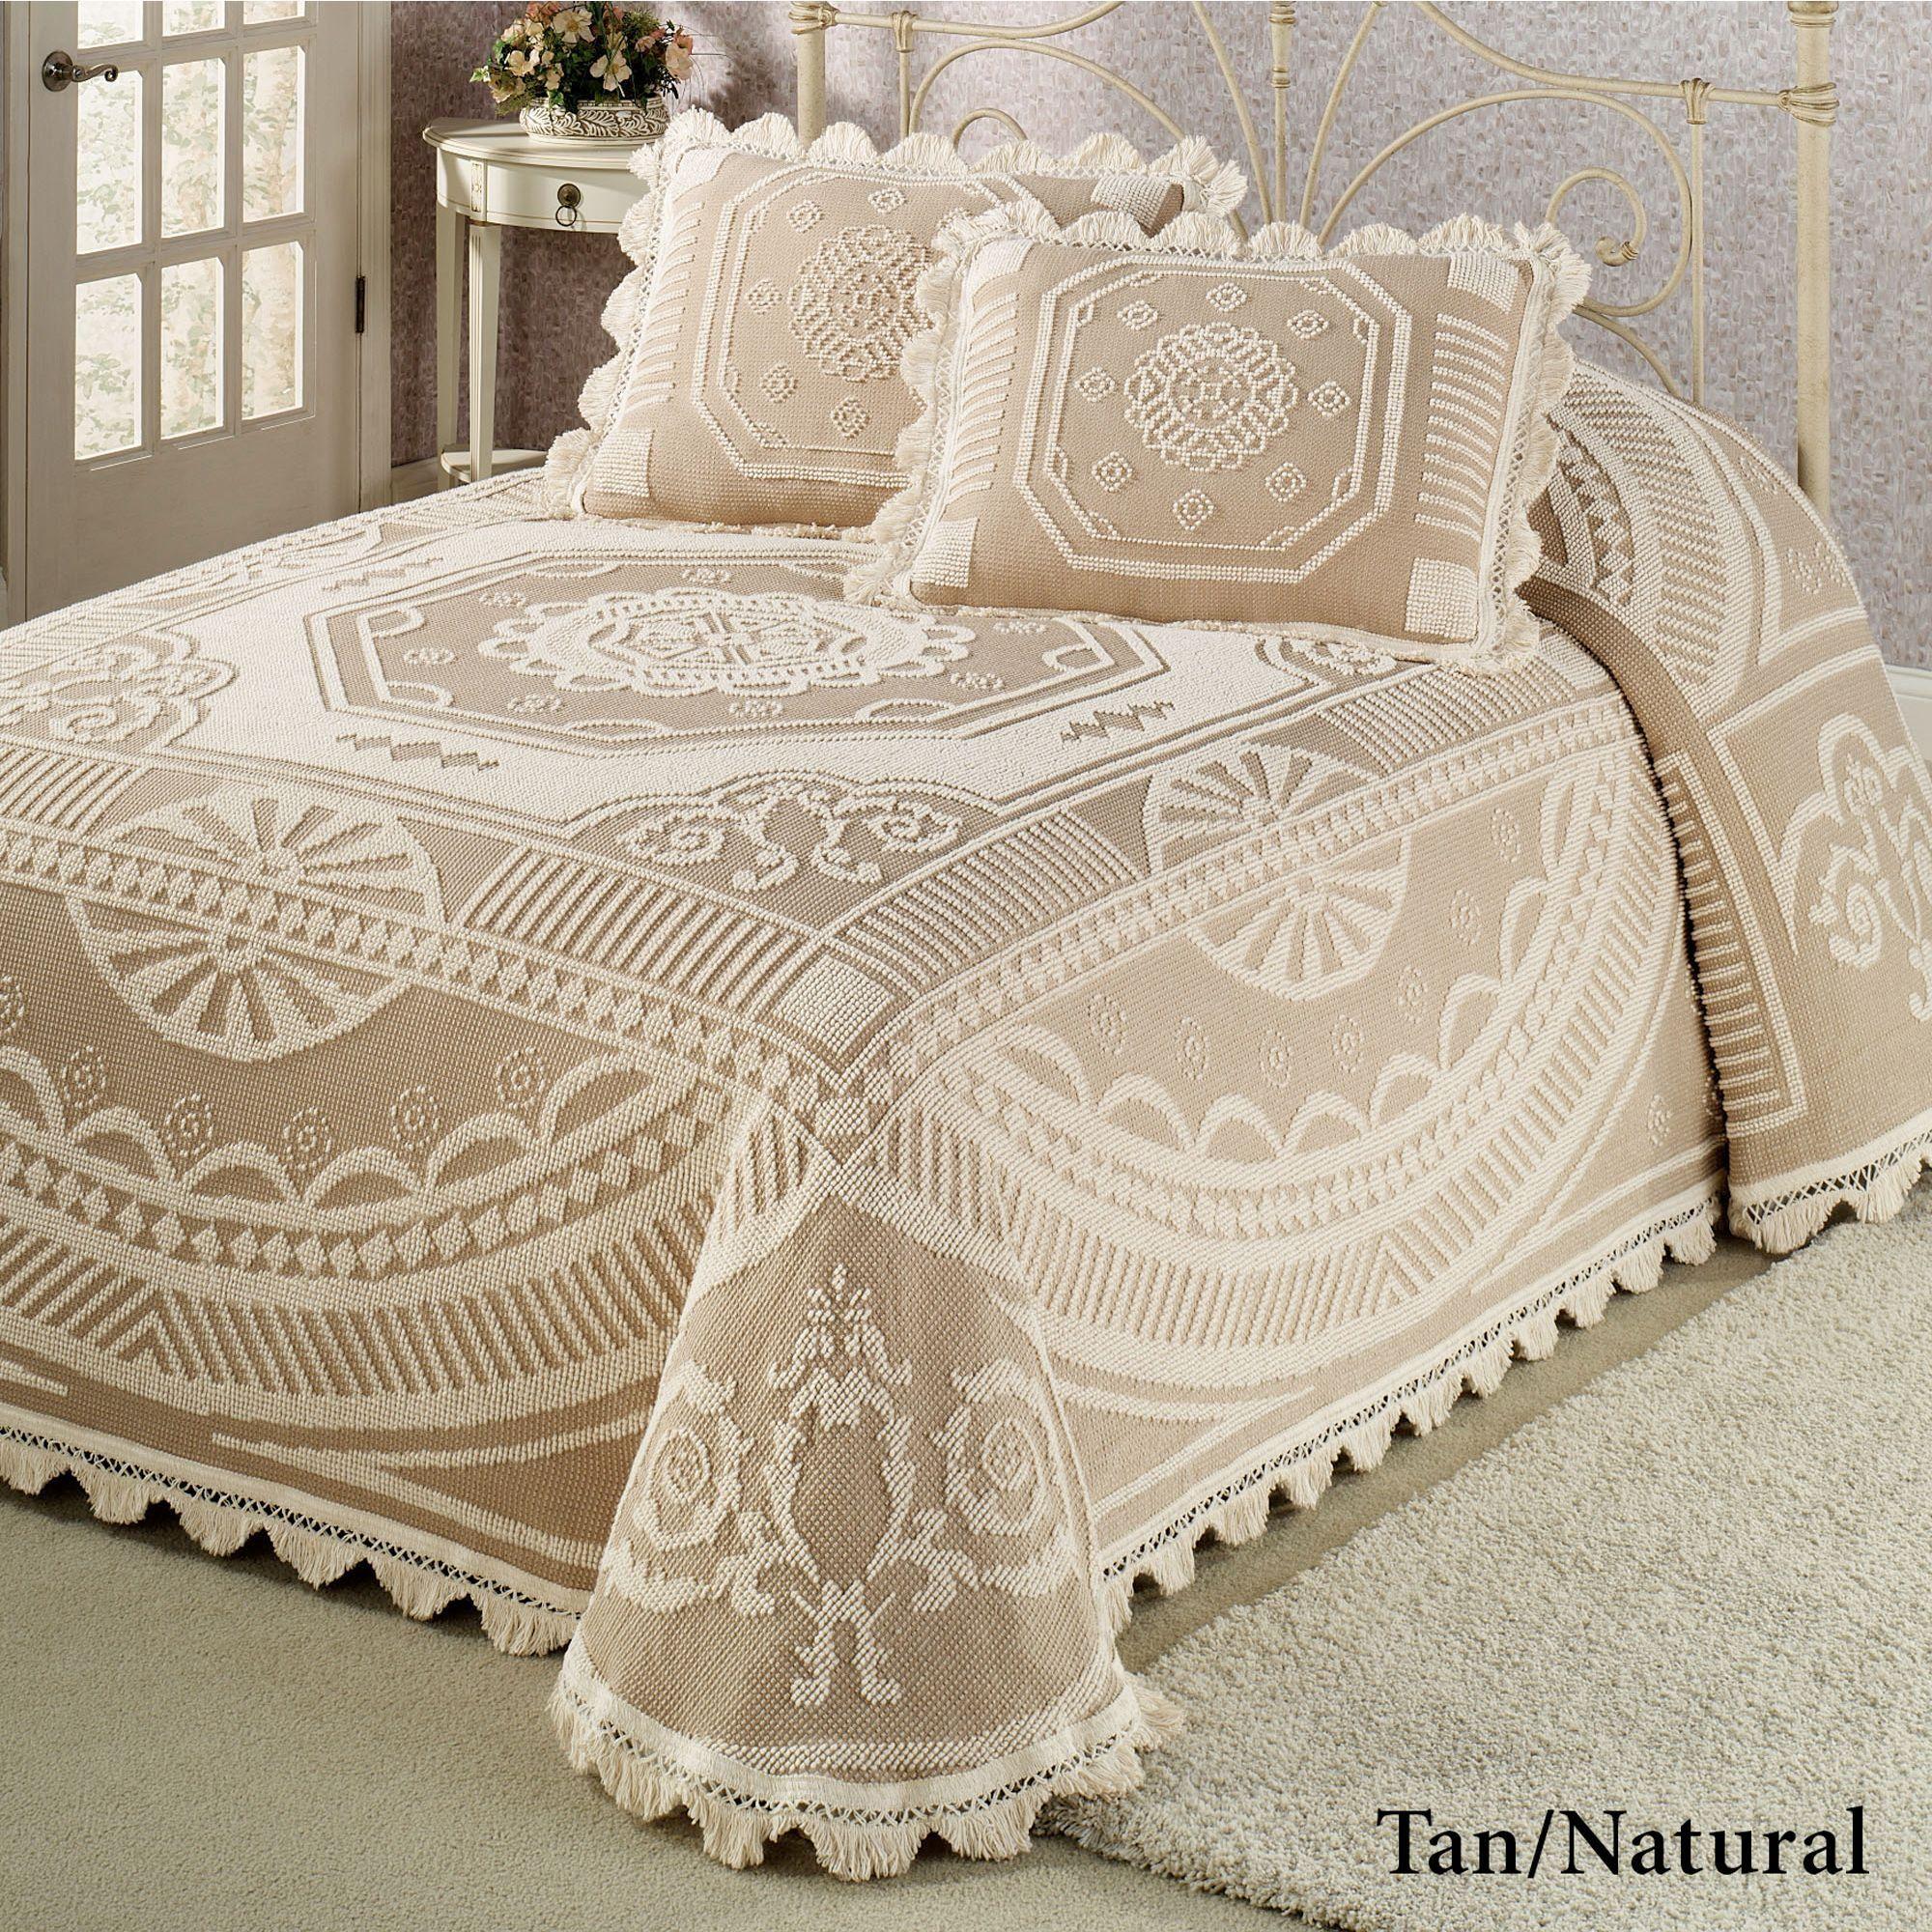 John Adams Candlewick Bedspread Bedding